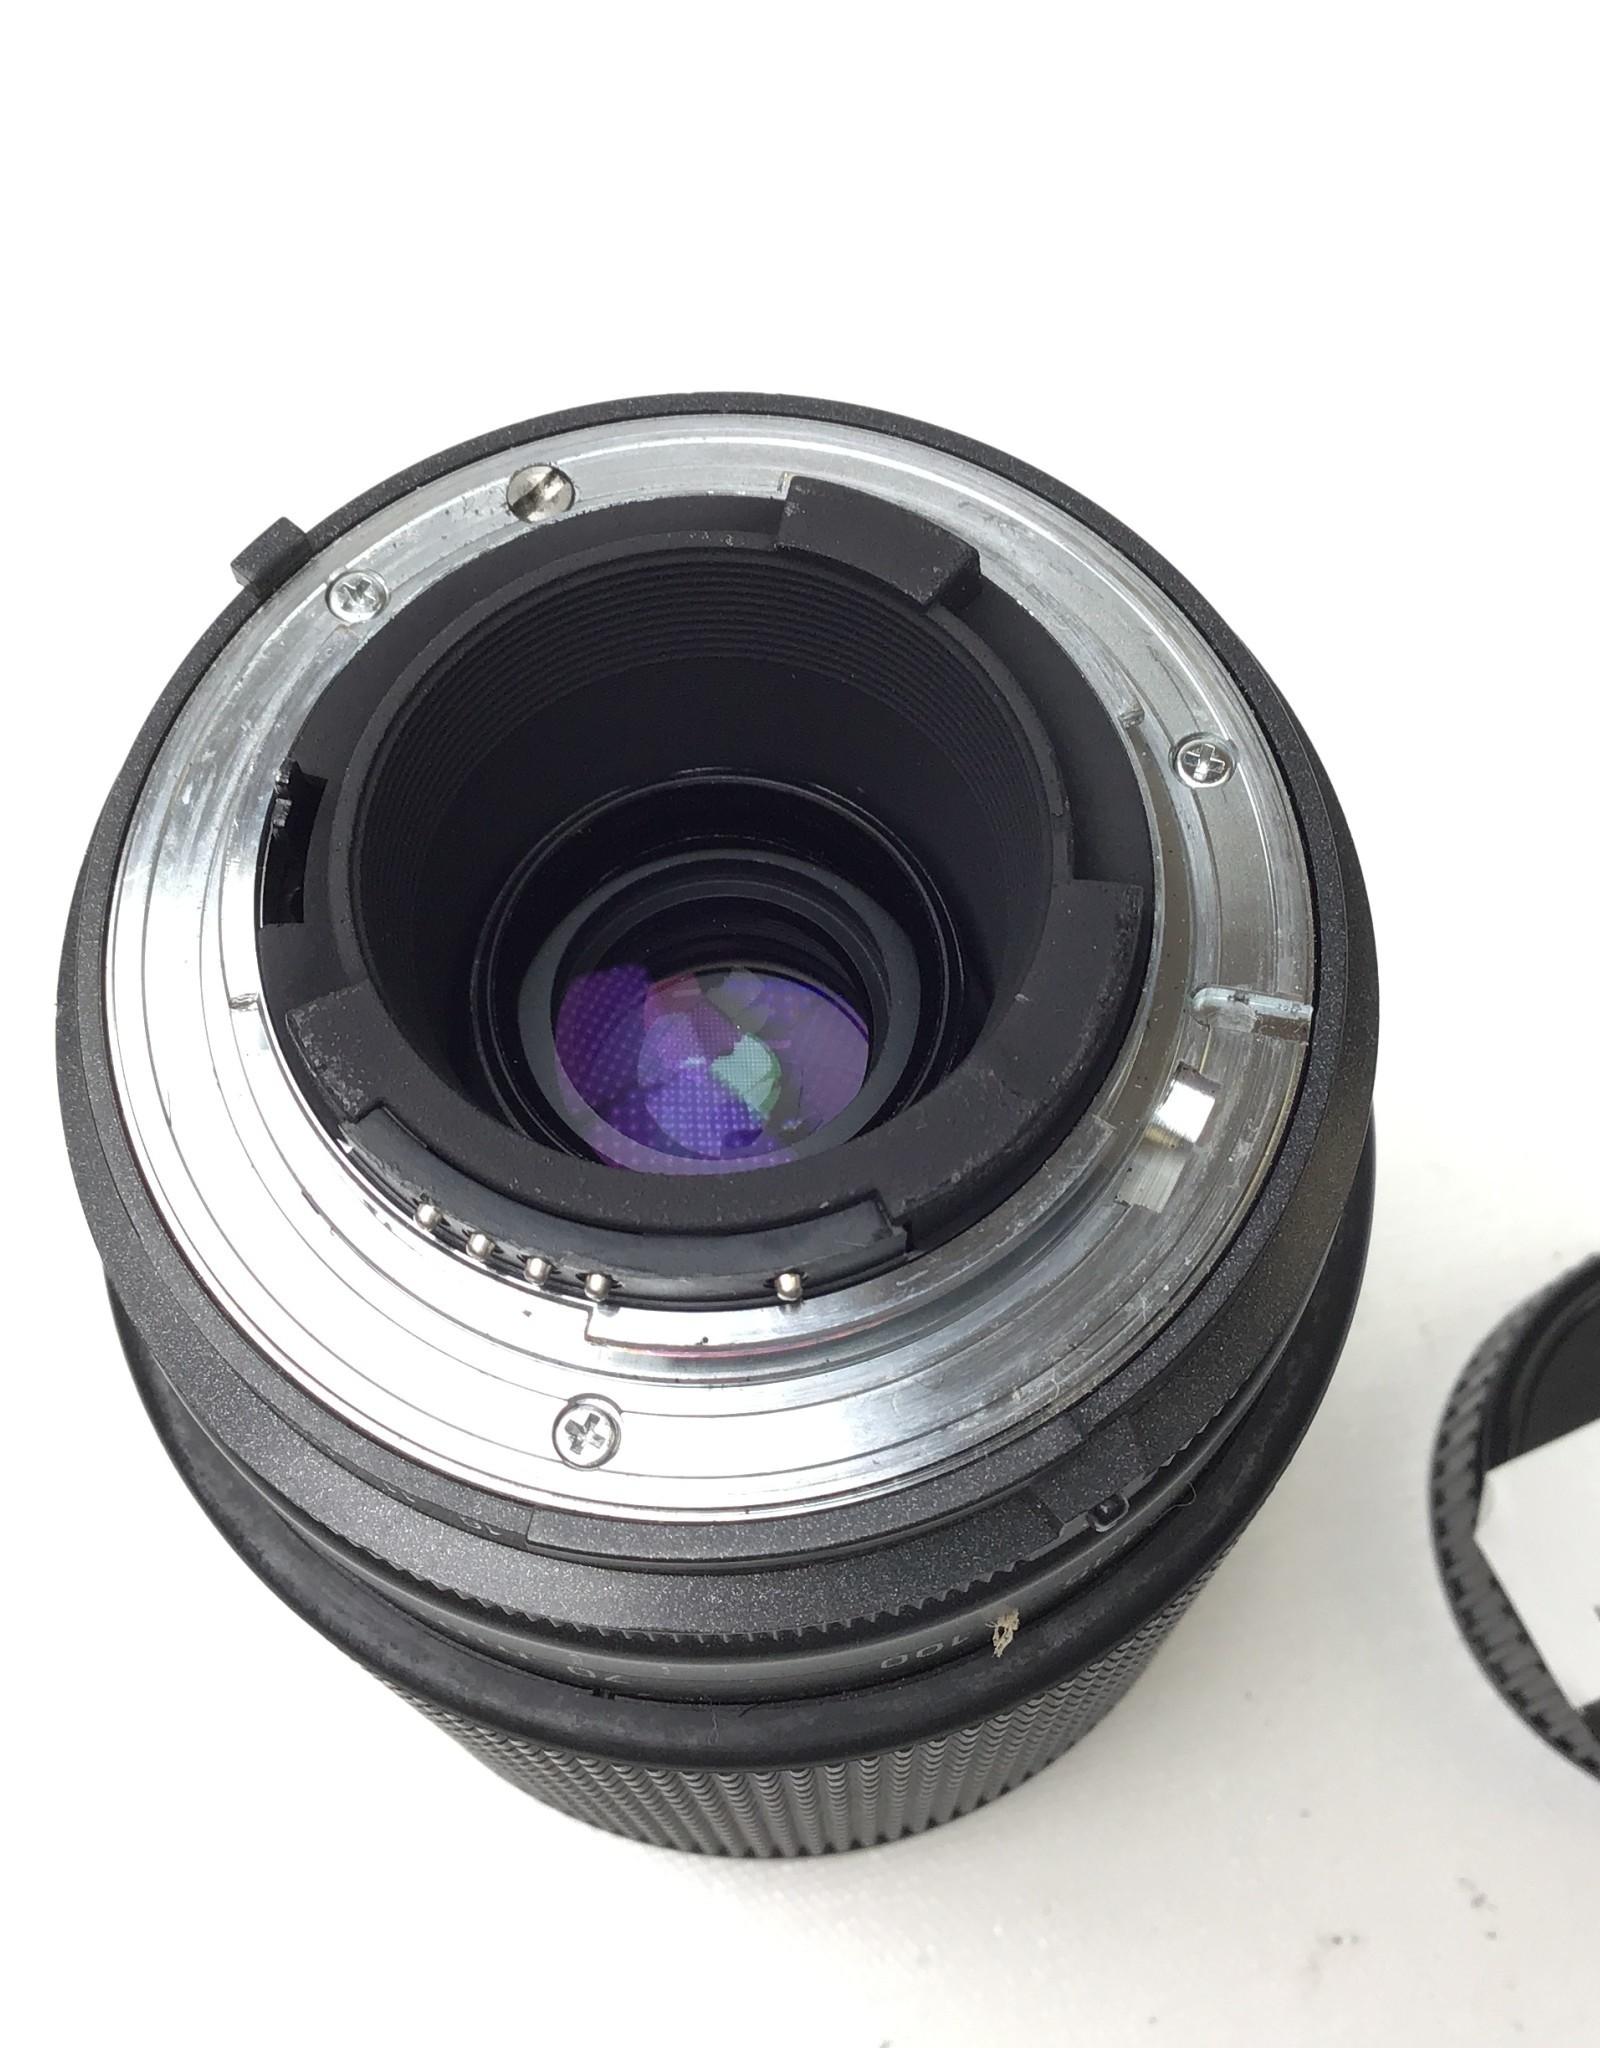 Promaster 70-300mm f4-5.6 Lens for Nikon Used Fair